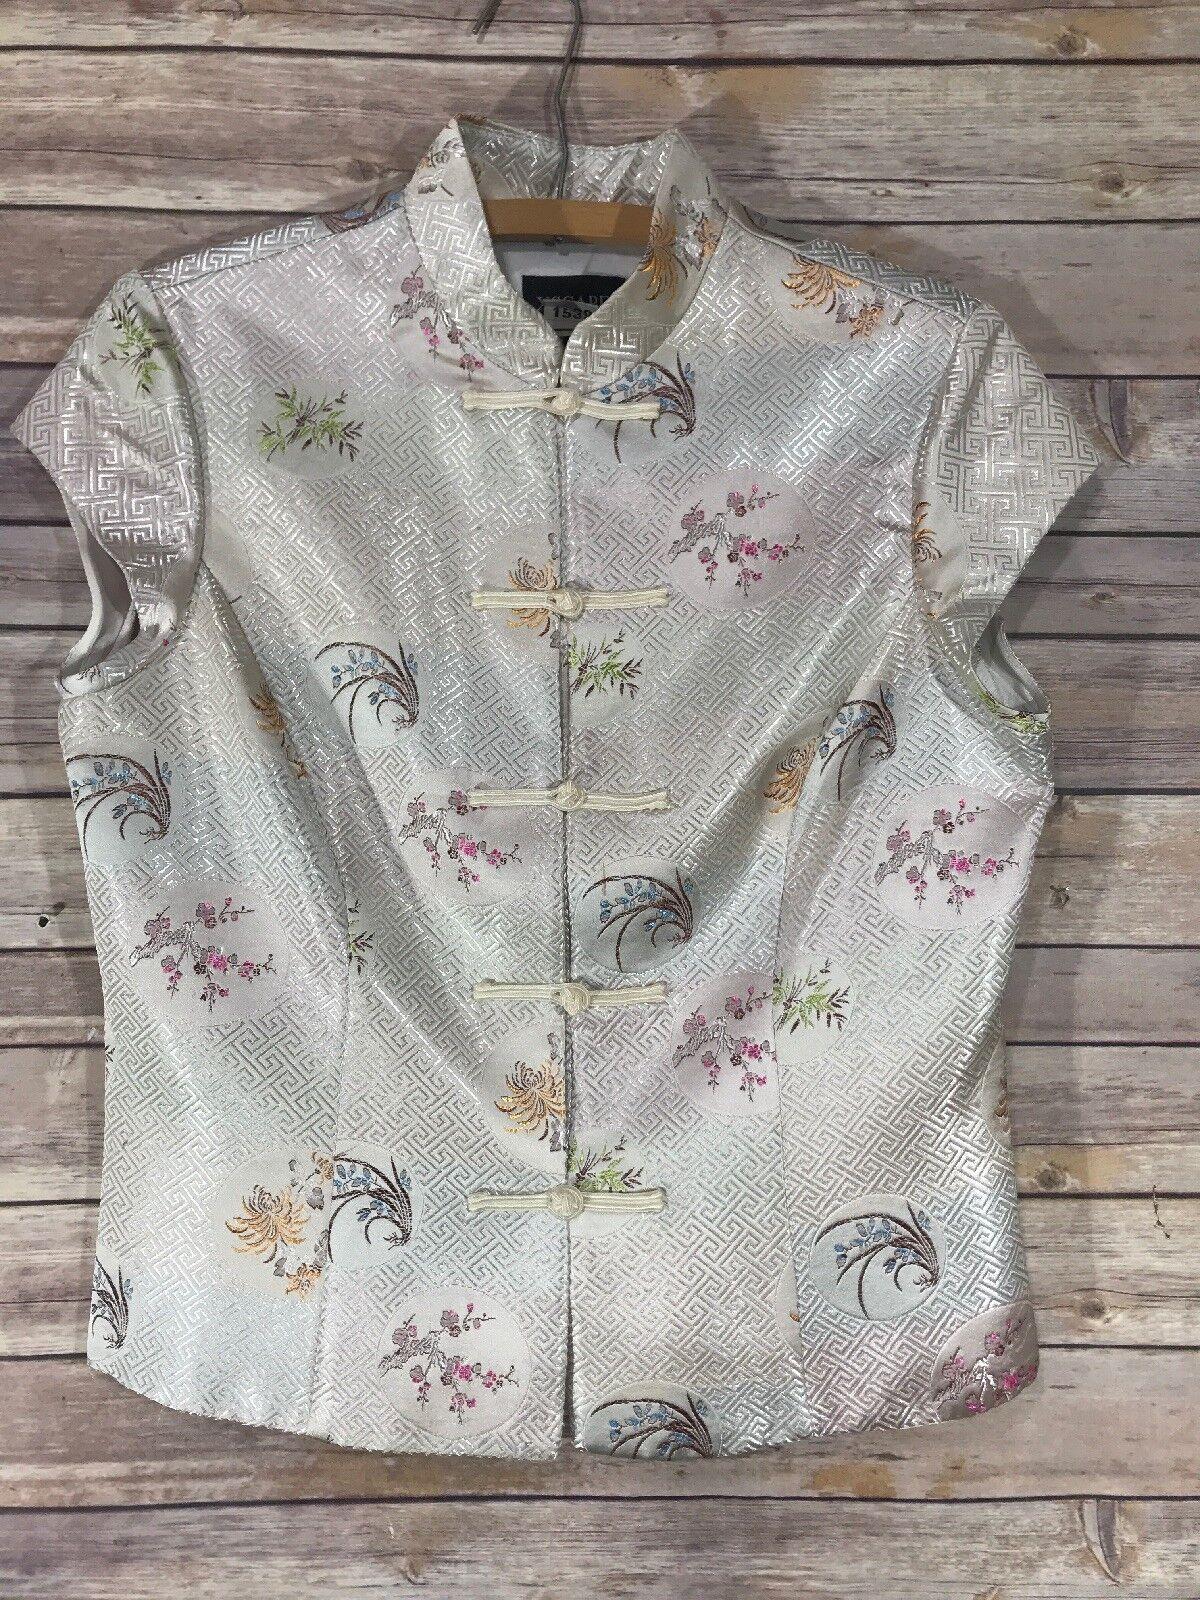 Xscape  by Joanna Chen Top Vest Sz 10 Asian Cap Sleeve Ivory 2464